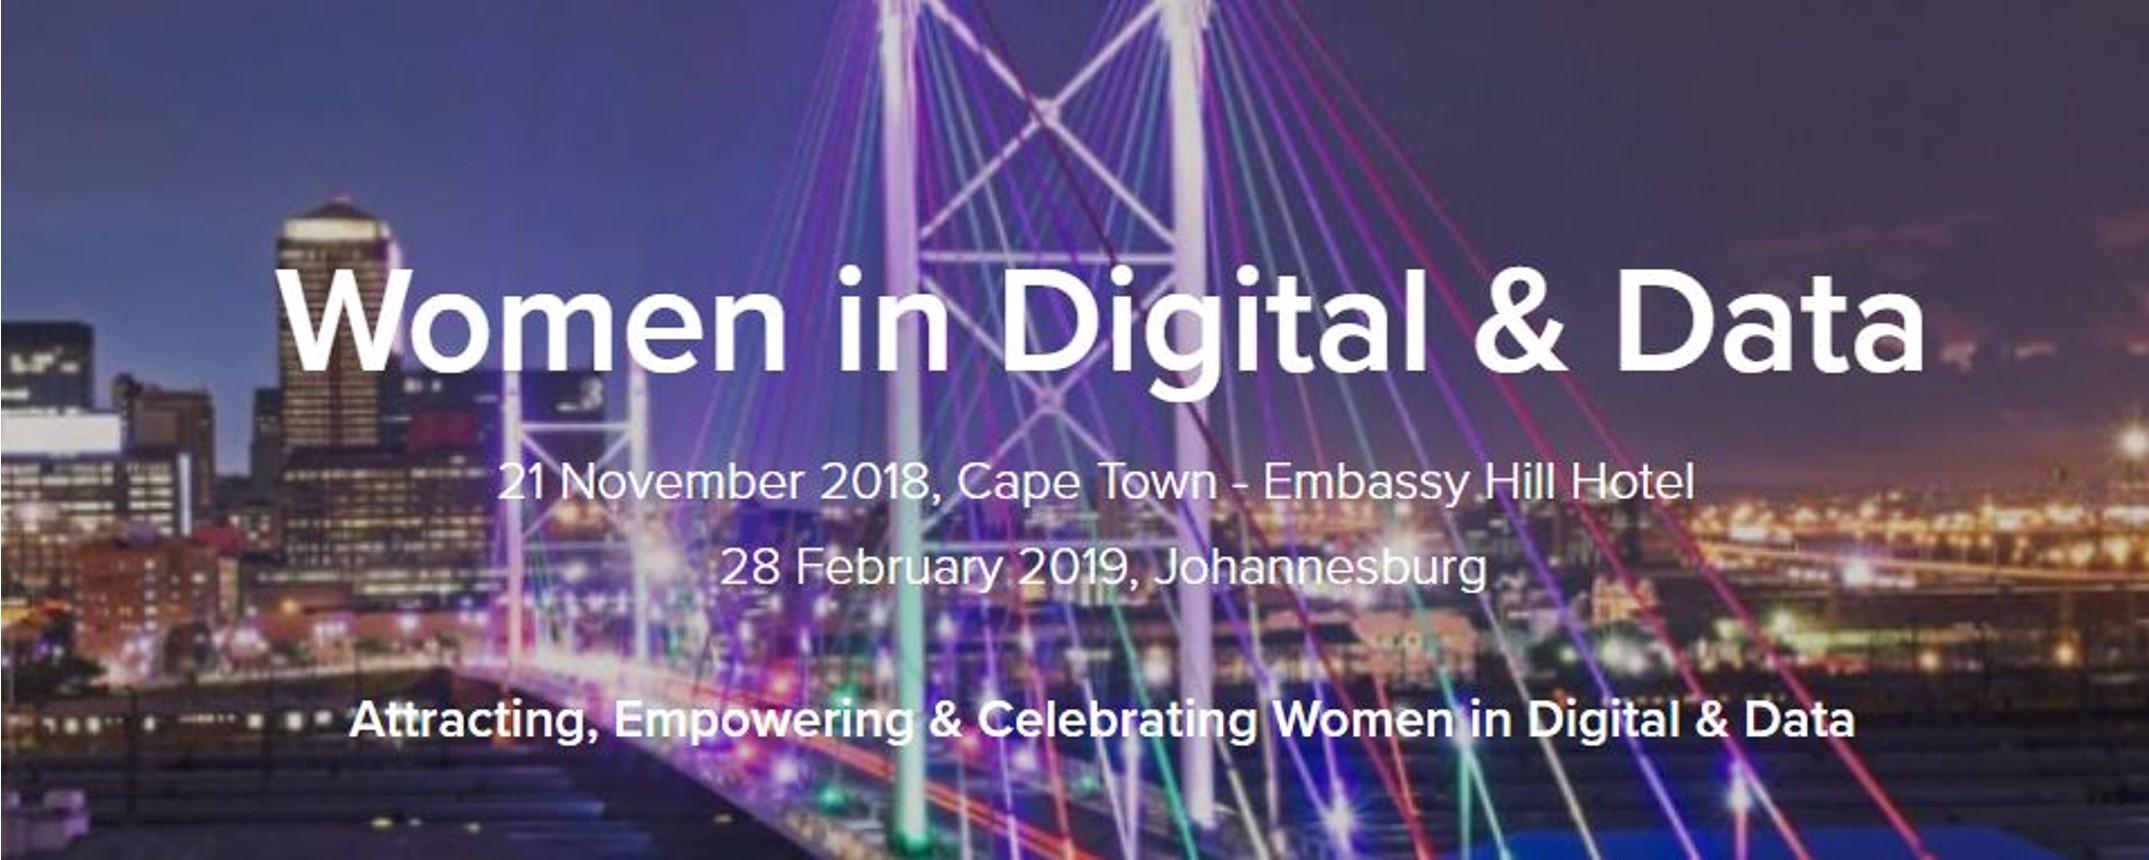 Corinium - Women in Digital & Data – Cape Town Movemeback African event cover image